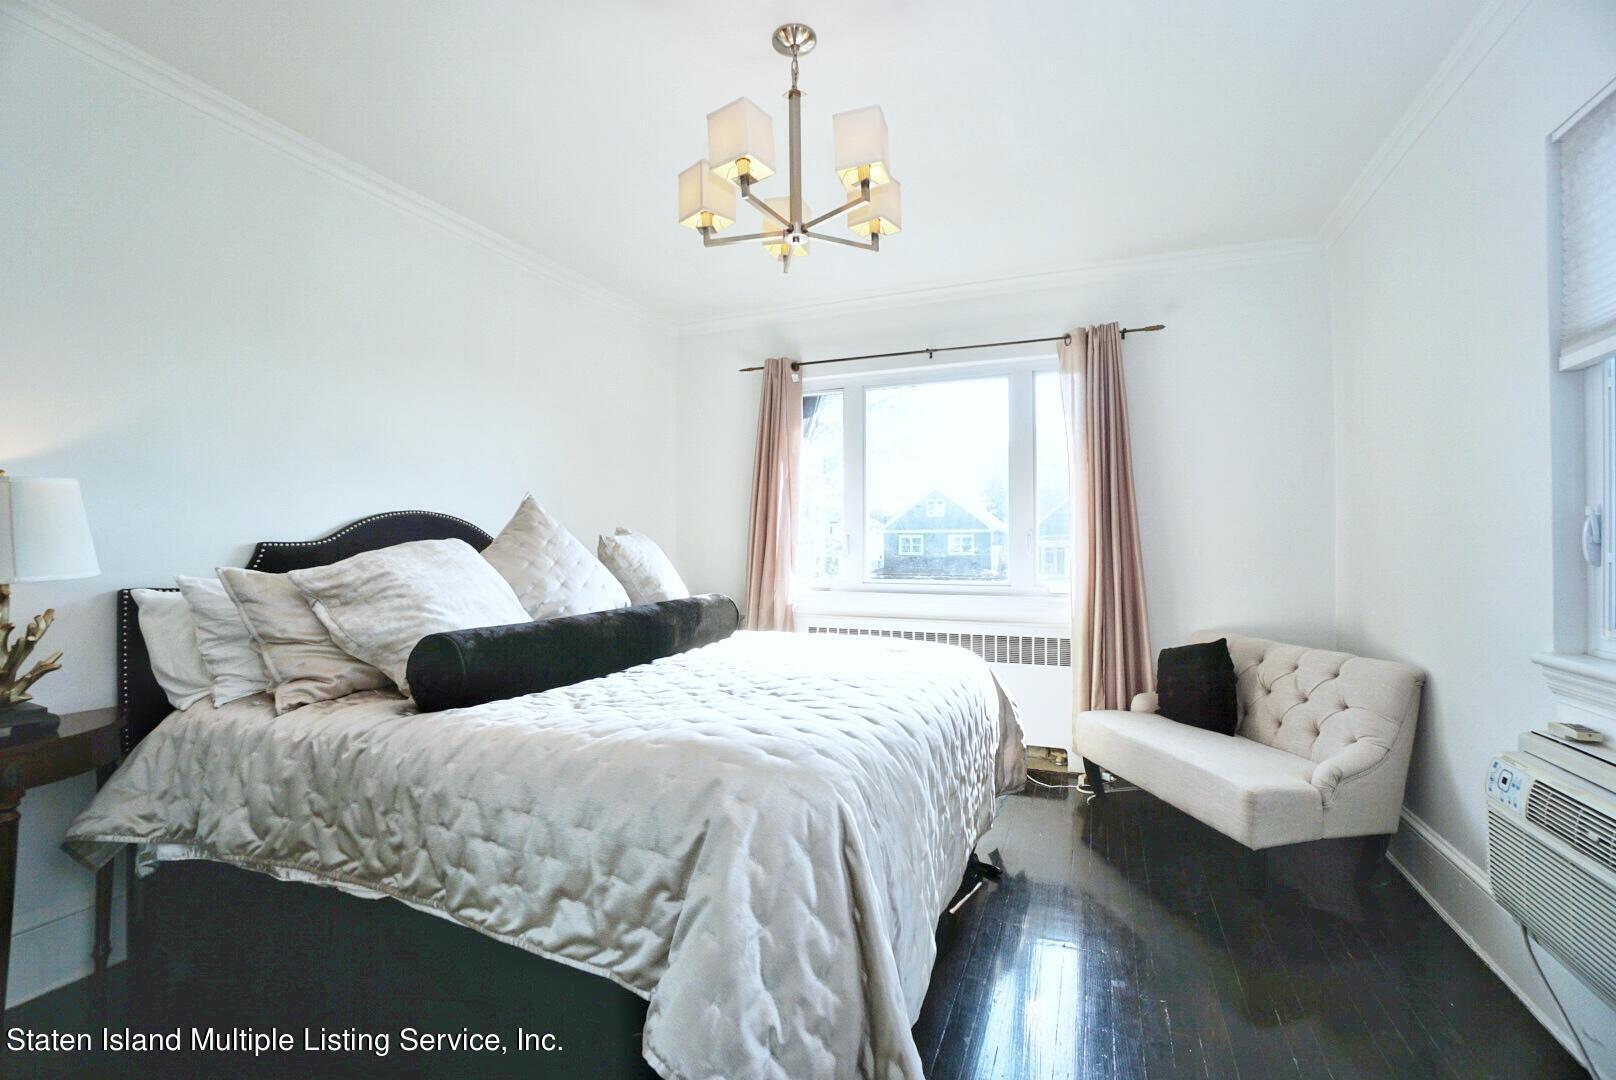 Single Family - Detached 311 Bement Avenue  Staten Island, NY 10310, MLS-1147133-21